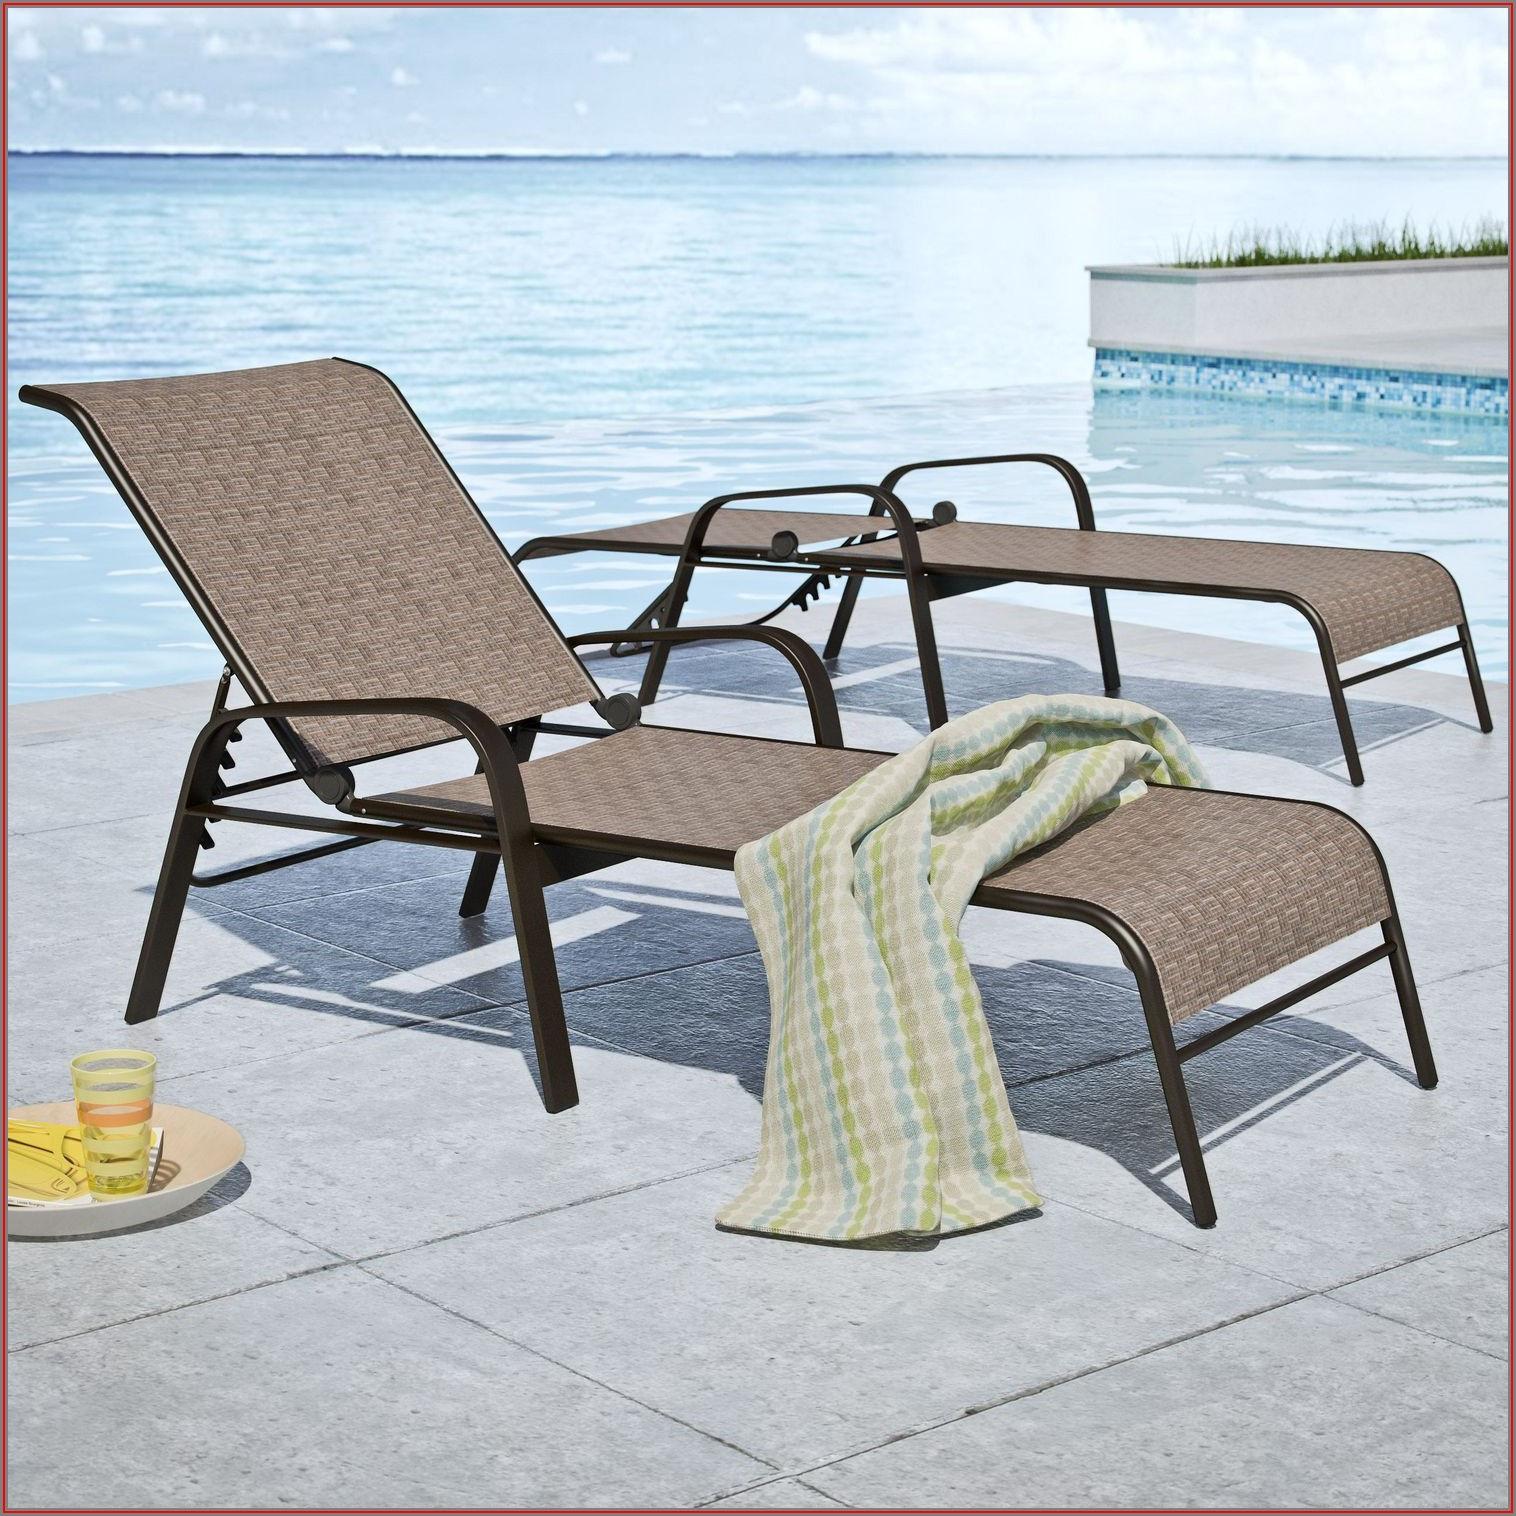 Walmart Patio Chaise Lounge Chairs